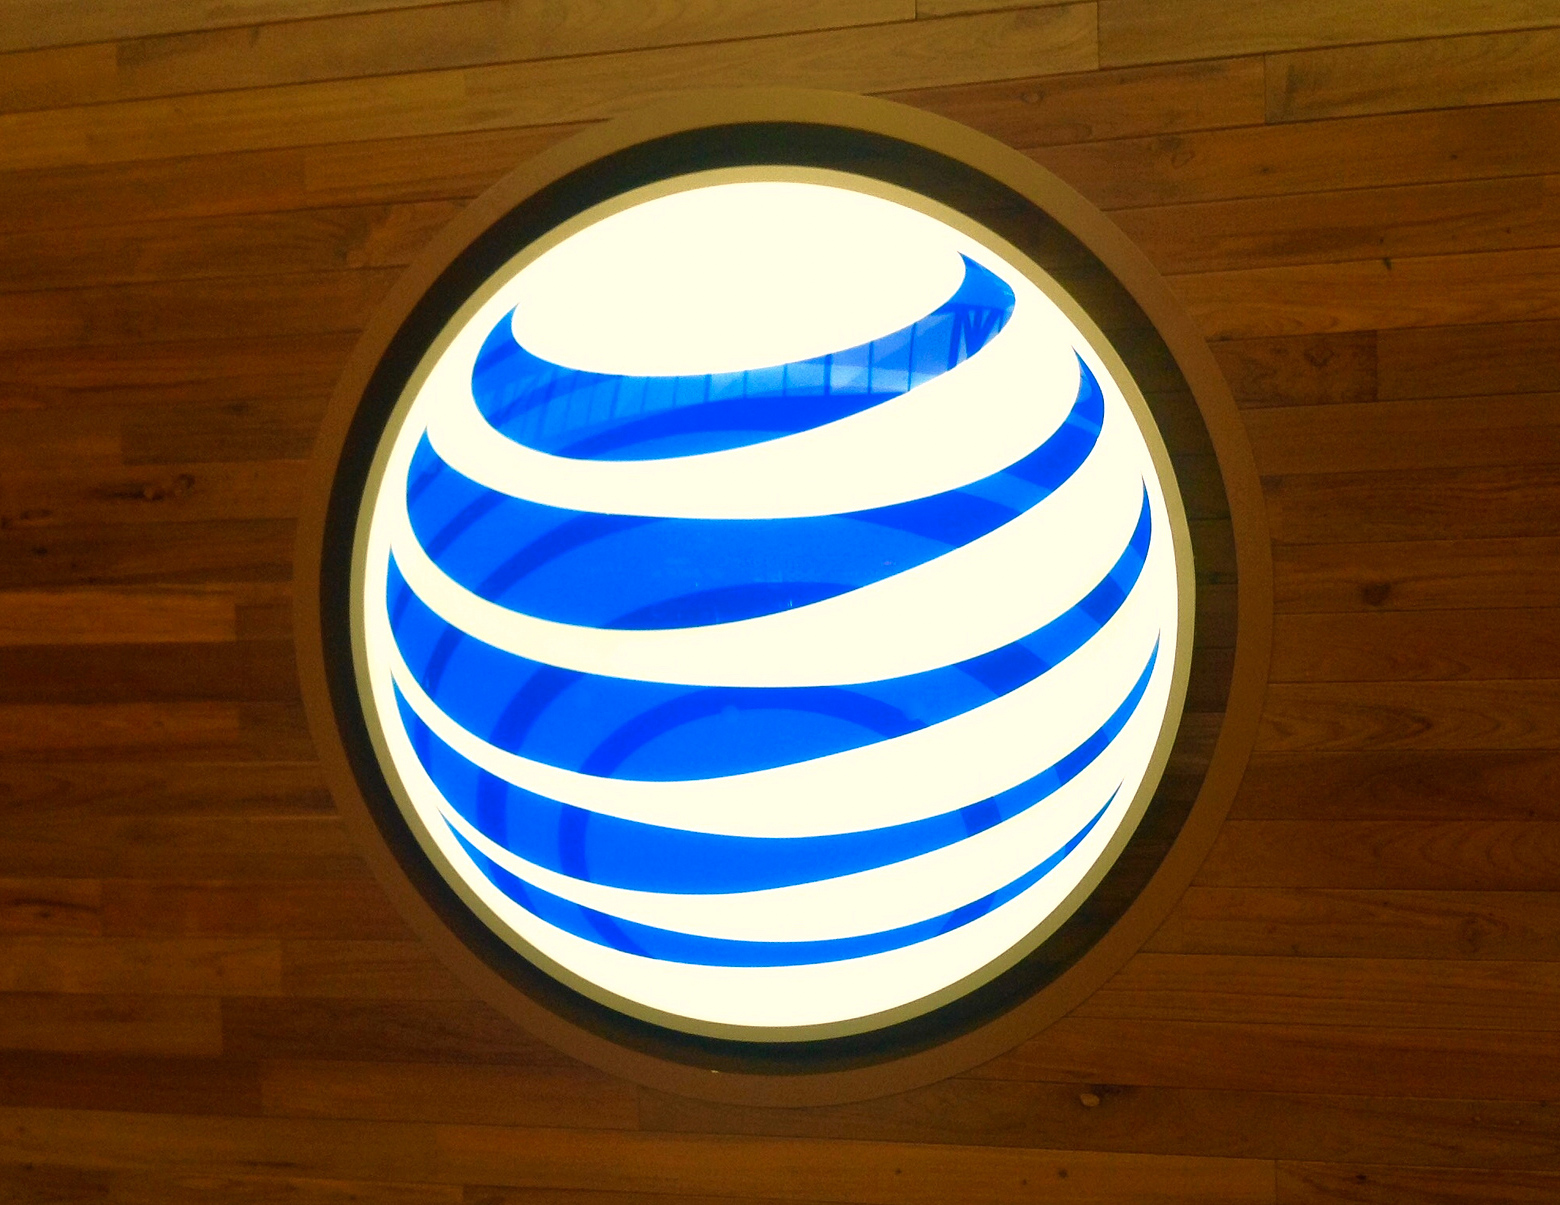 AT&T Unlimited Plan hotspot details